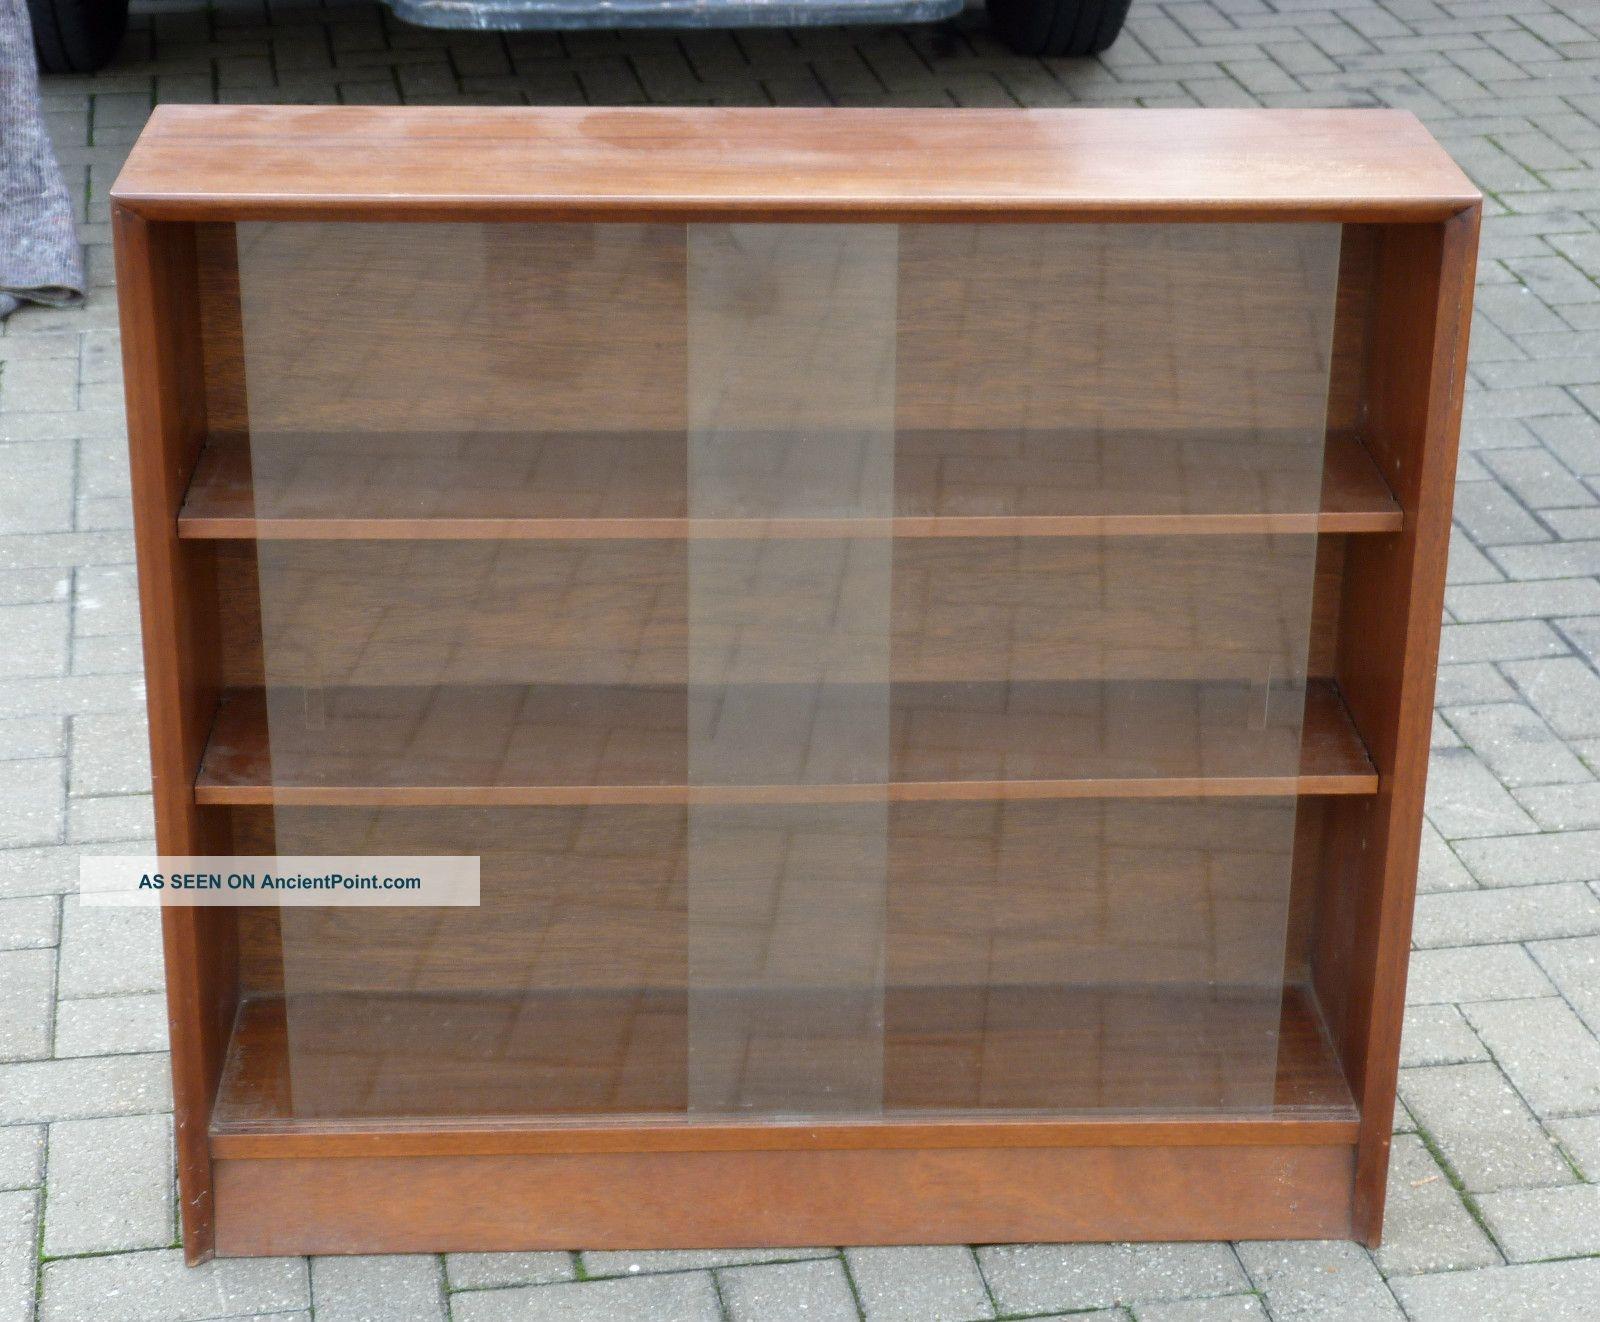 Shelves With Sliding Glass DoorsShelves With Sliding Glass Doors